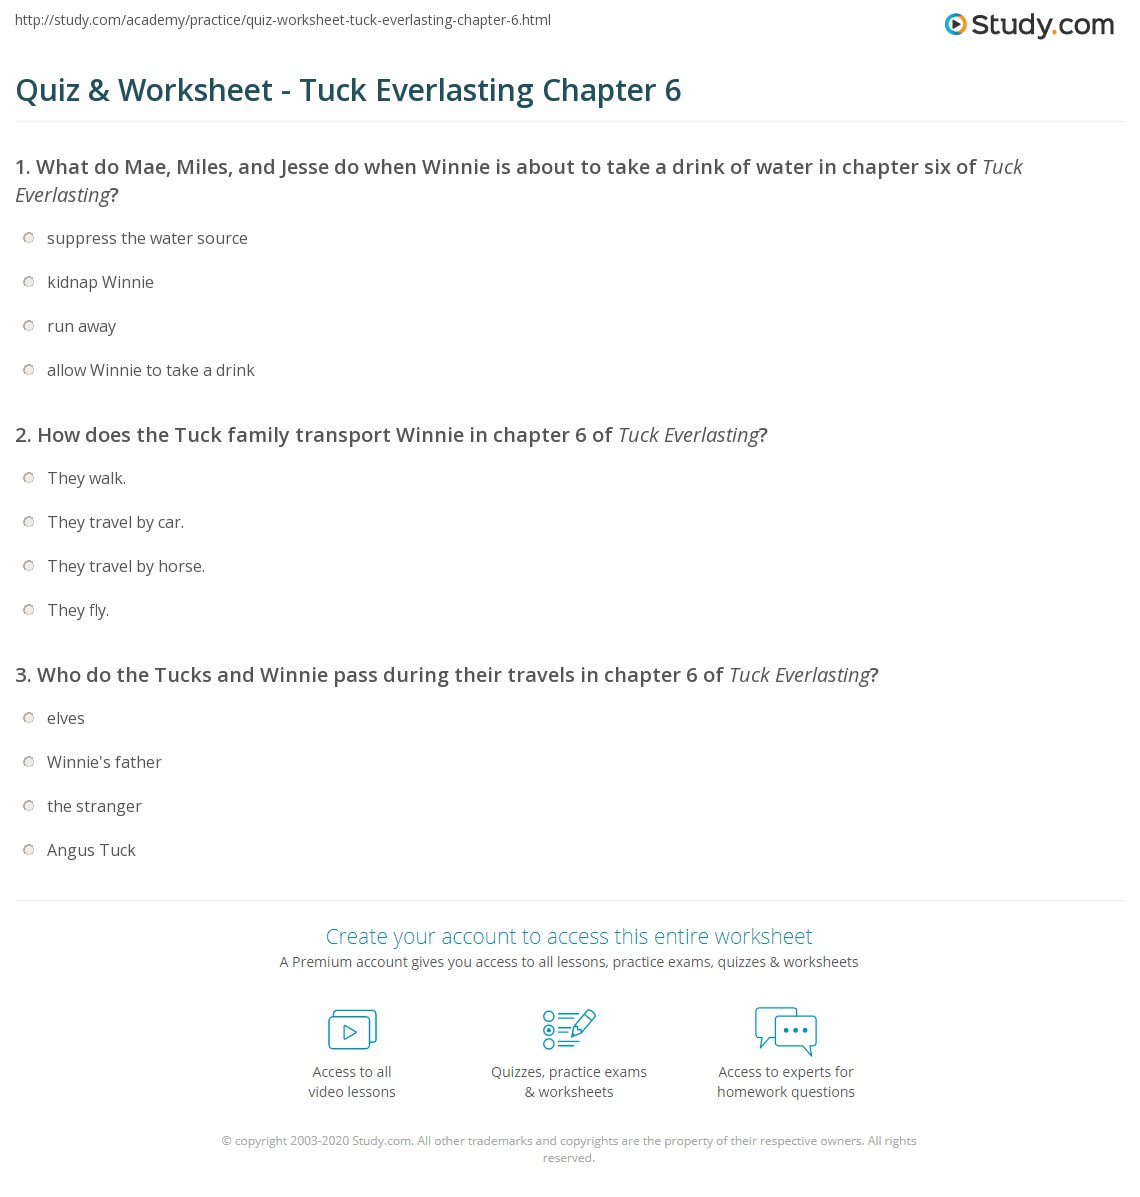 Quiz & Worksheet - Tuck Everlasting Chapter 6 | Study.com